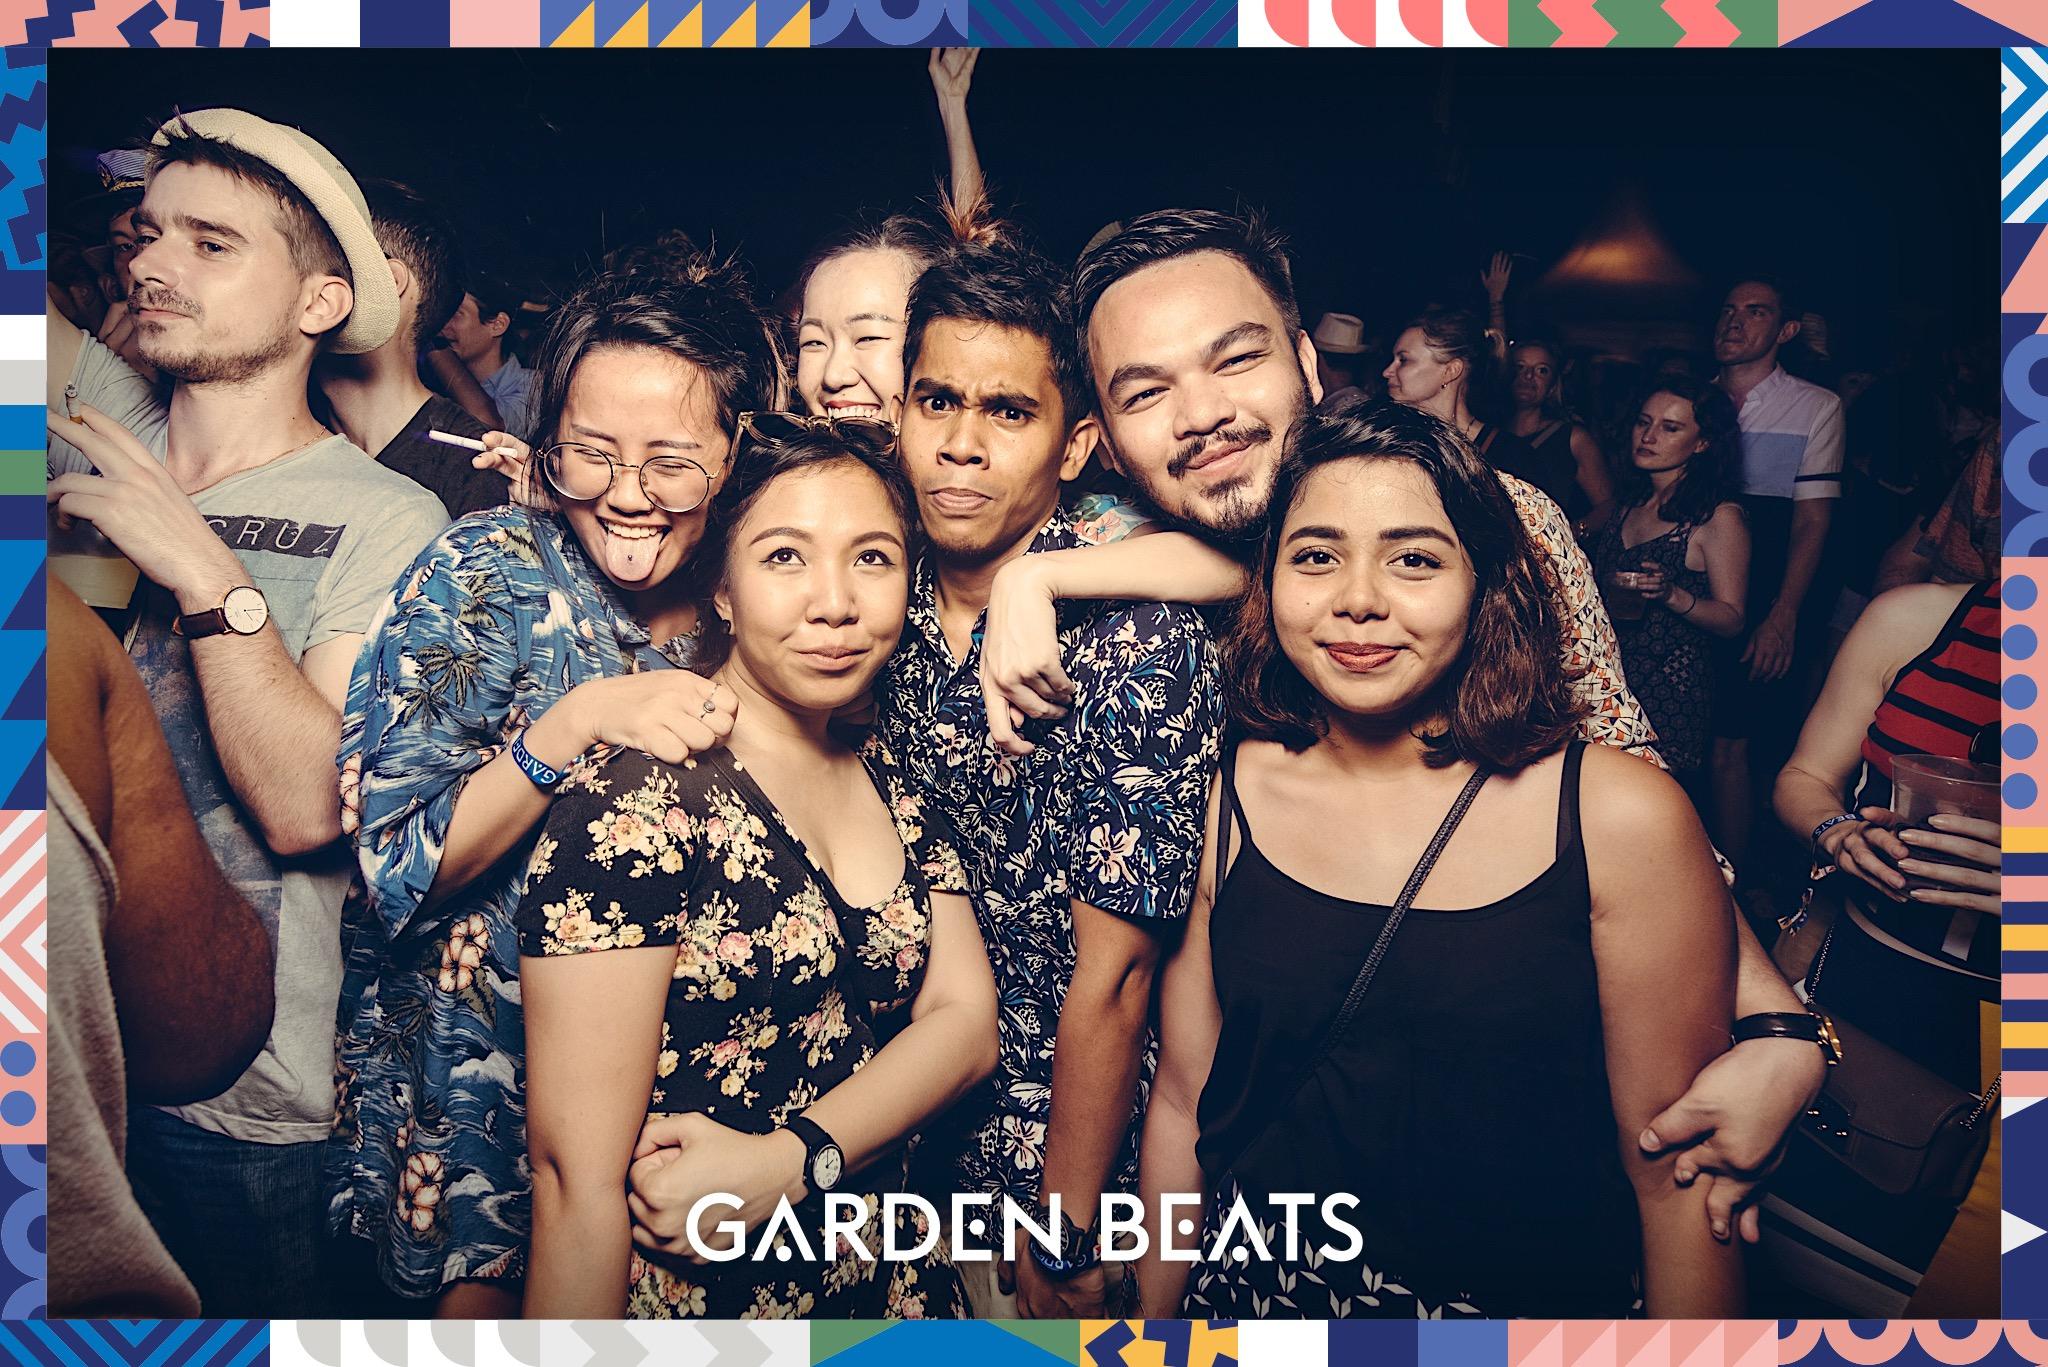 18032017_GardenBeats_Colossal789_WatermarkedGB.jpg